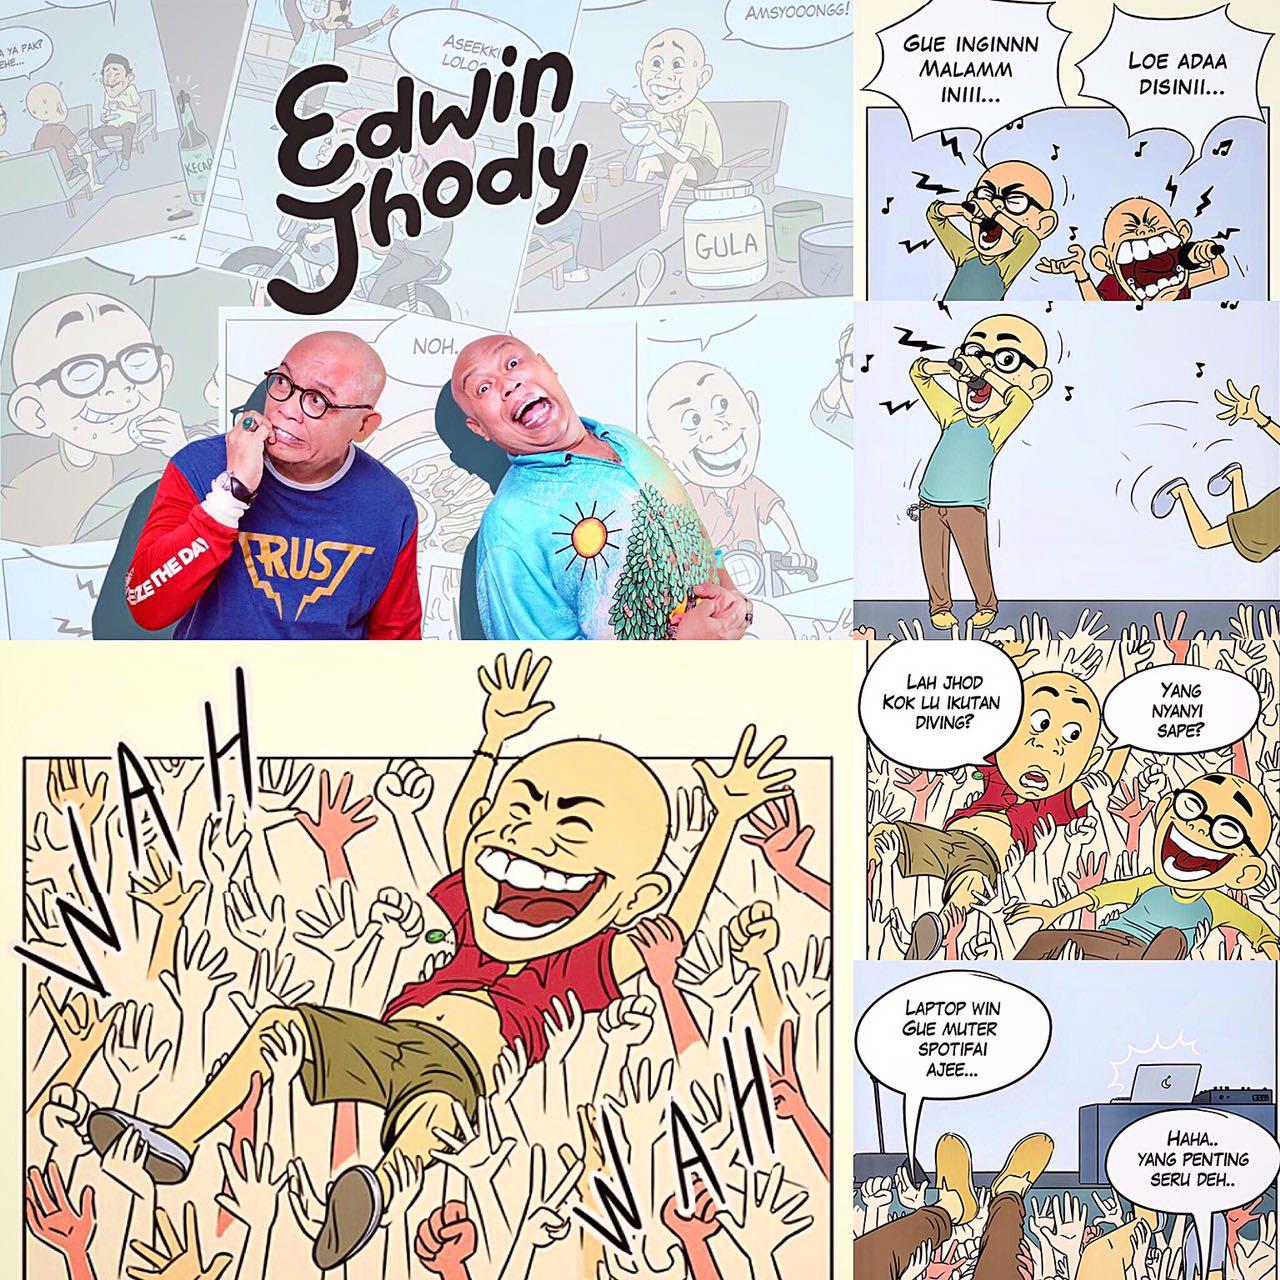 Edwin Jhody Comics